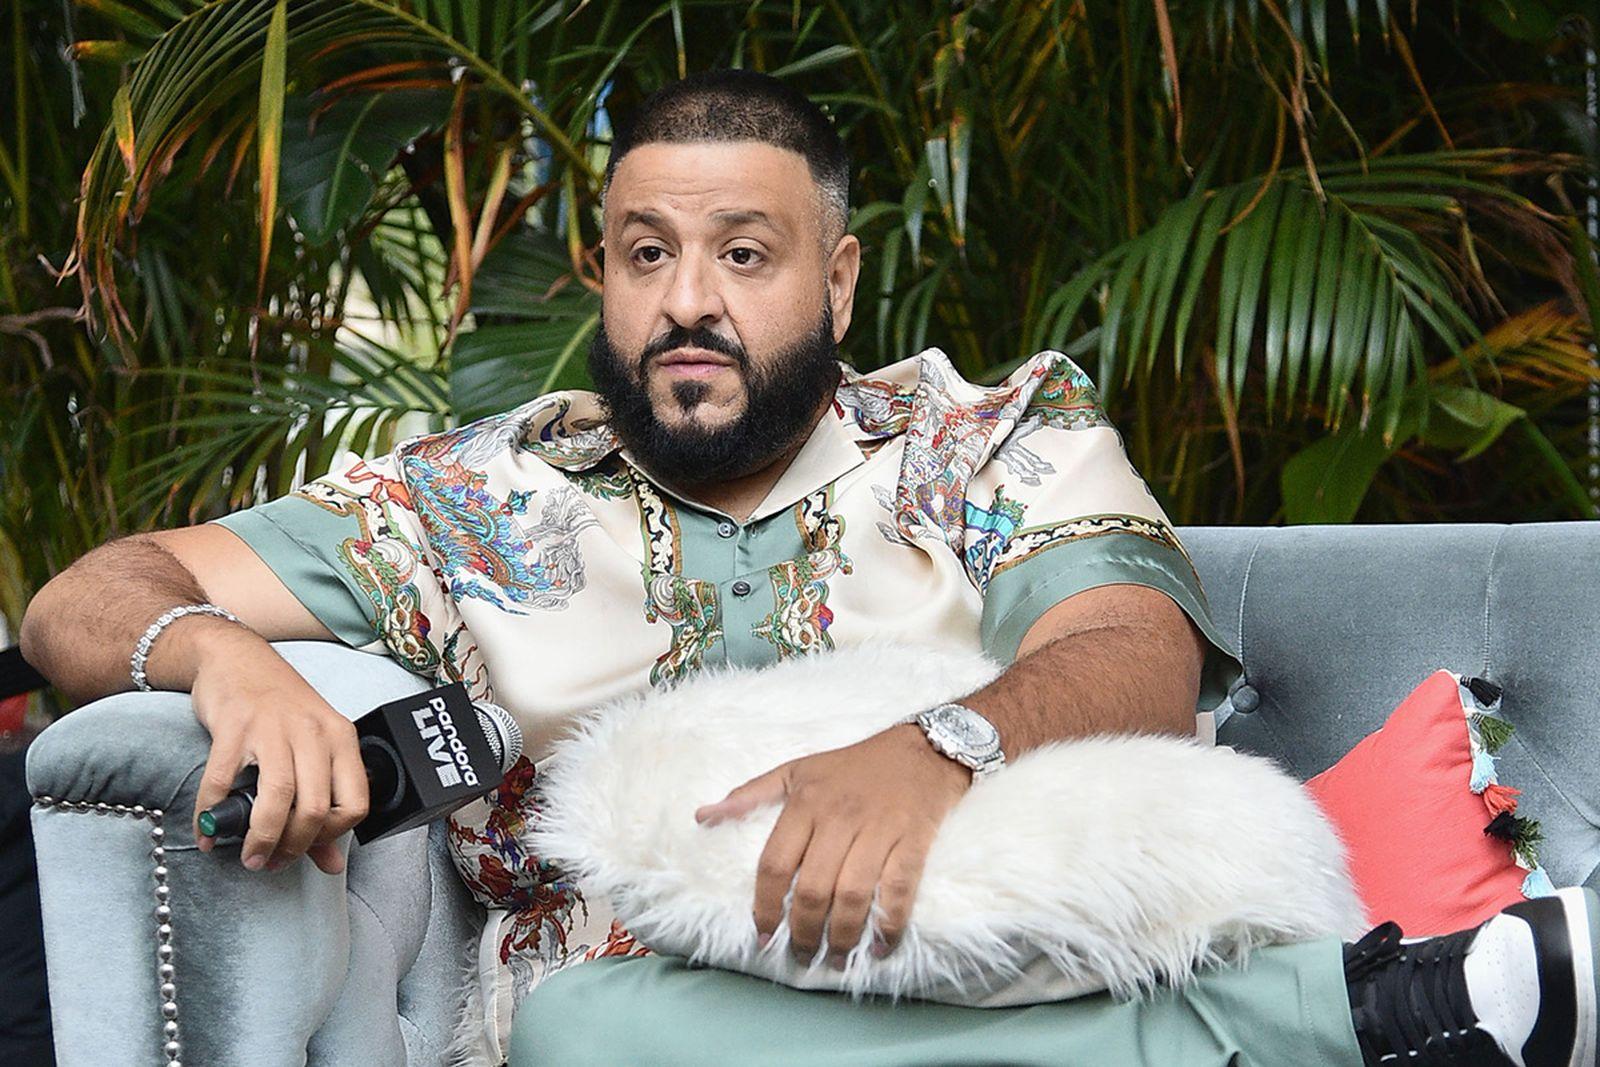 dj khaled suing billboard Father of Asahd IGOR the creator